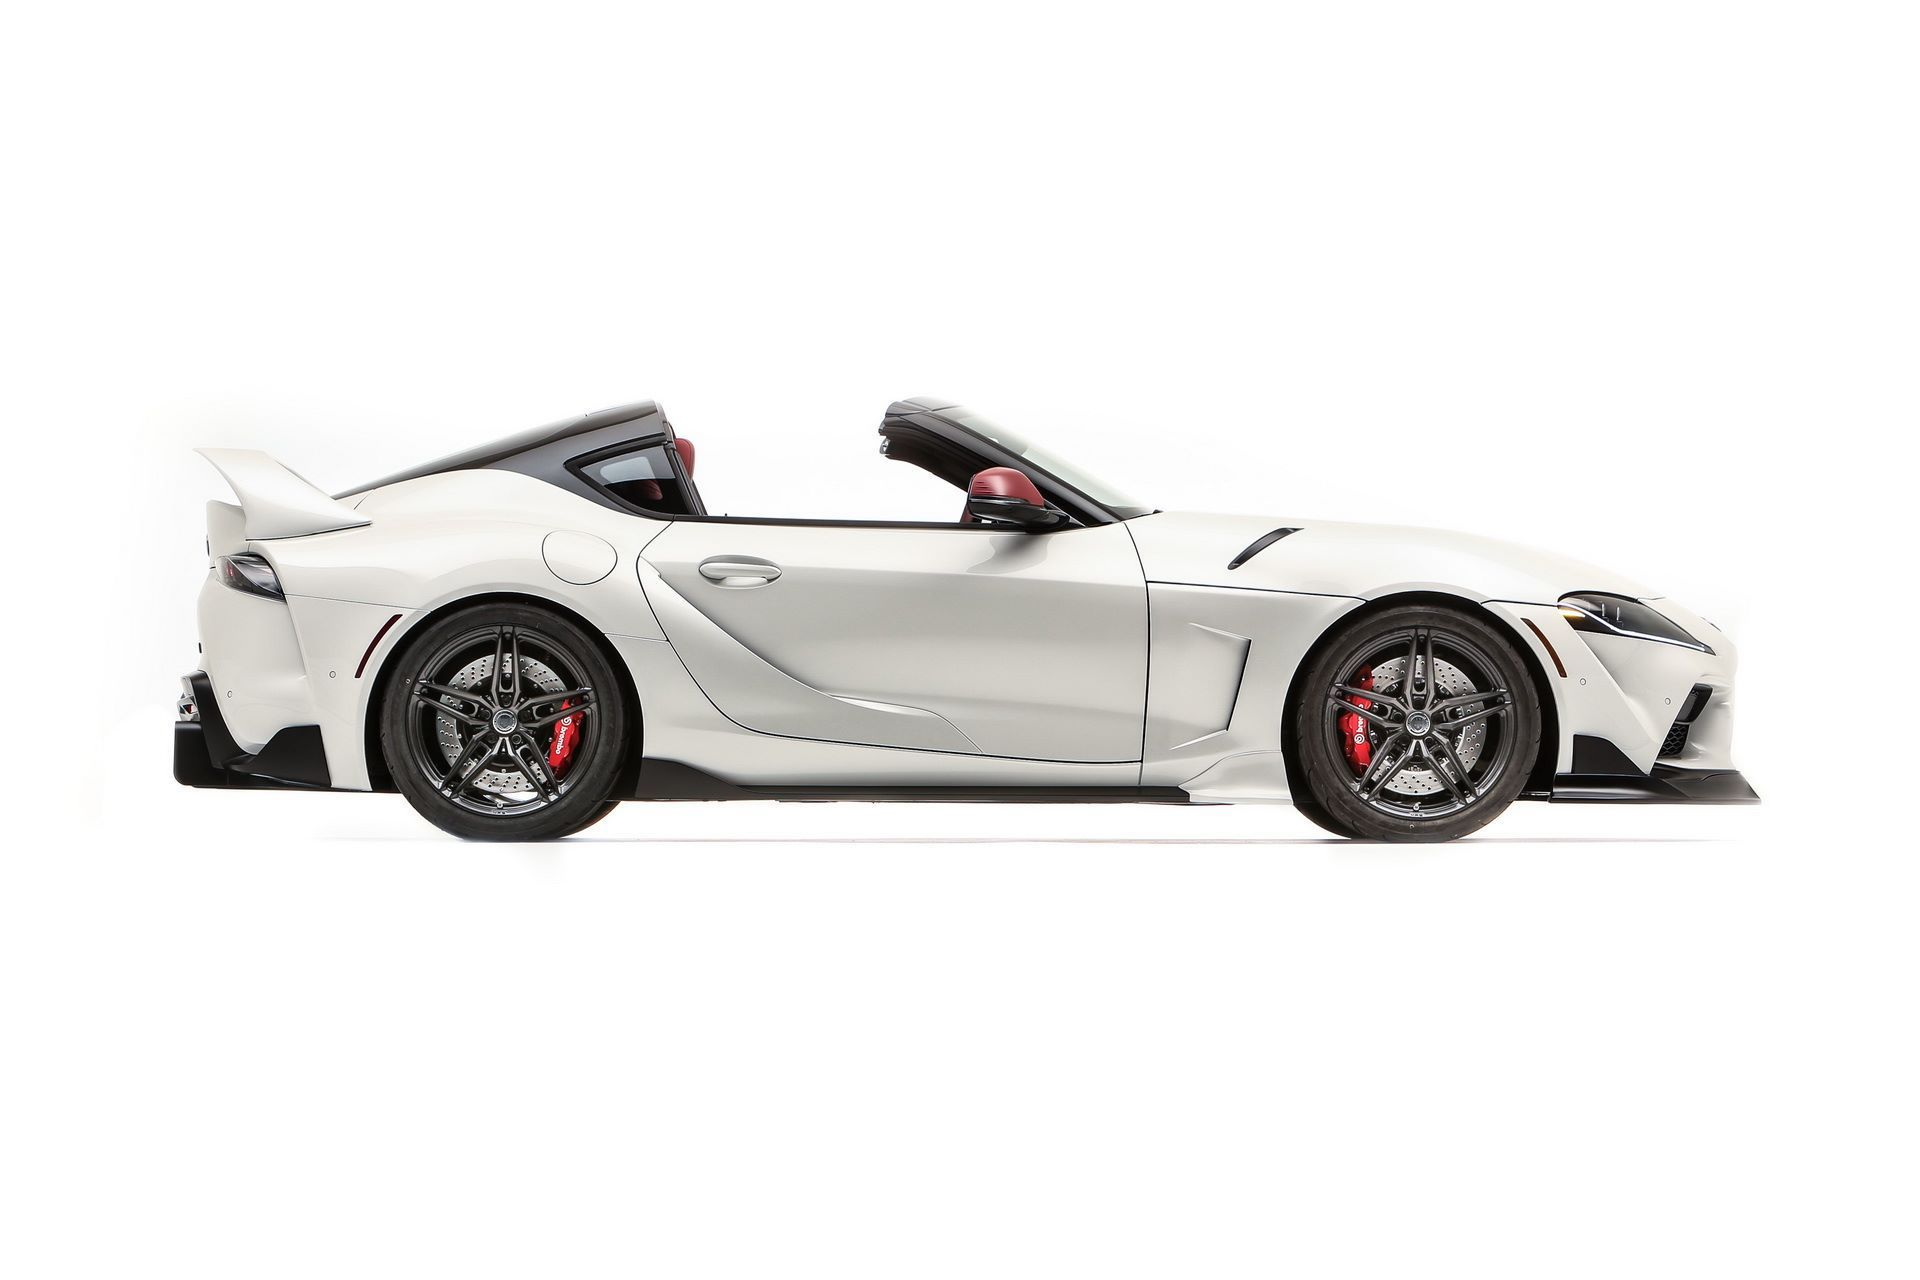 toyota-sema-2020-new-cars-13